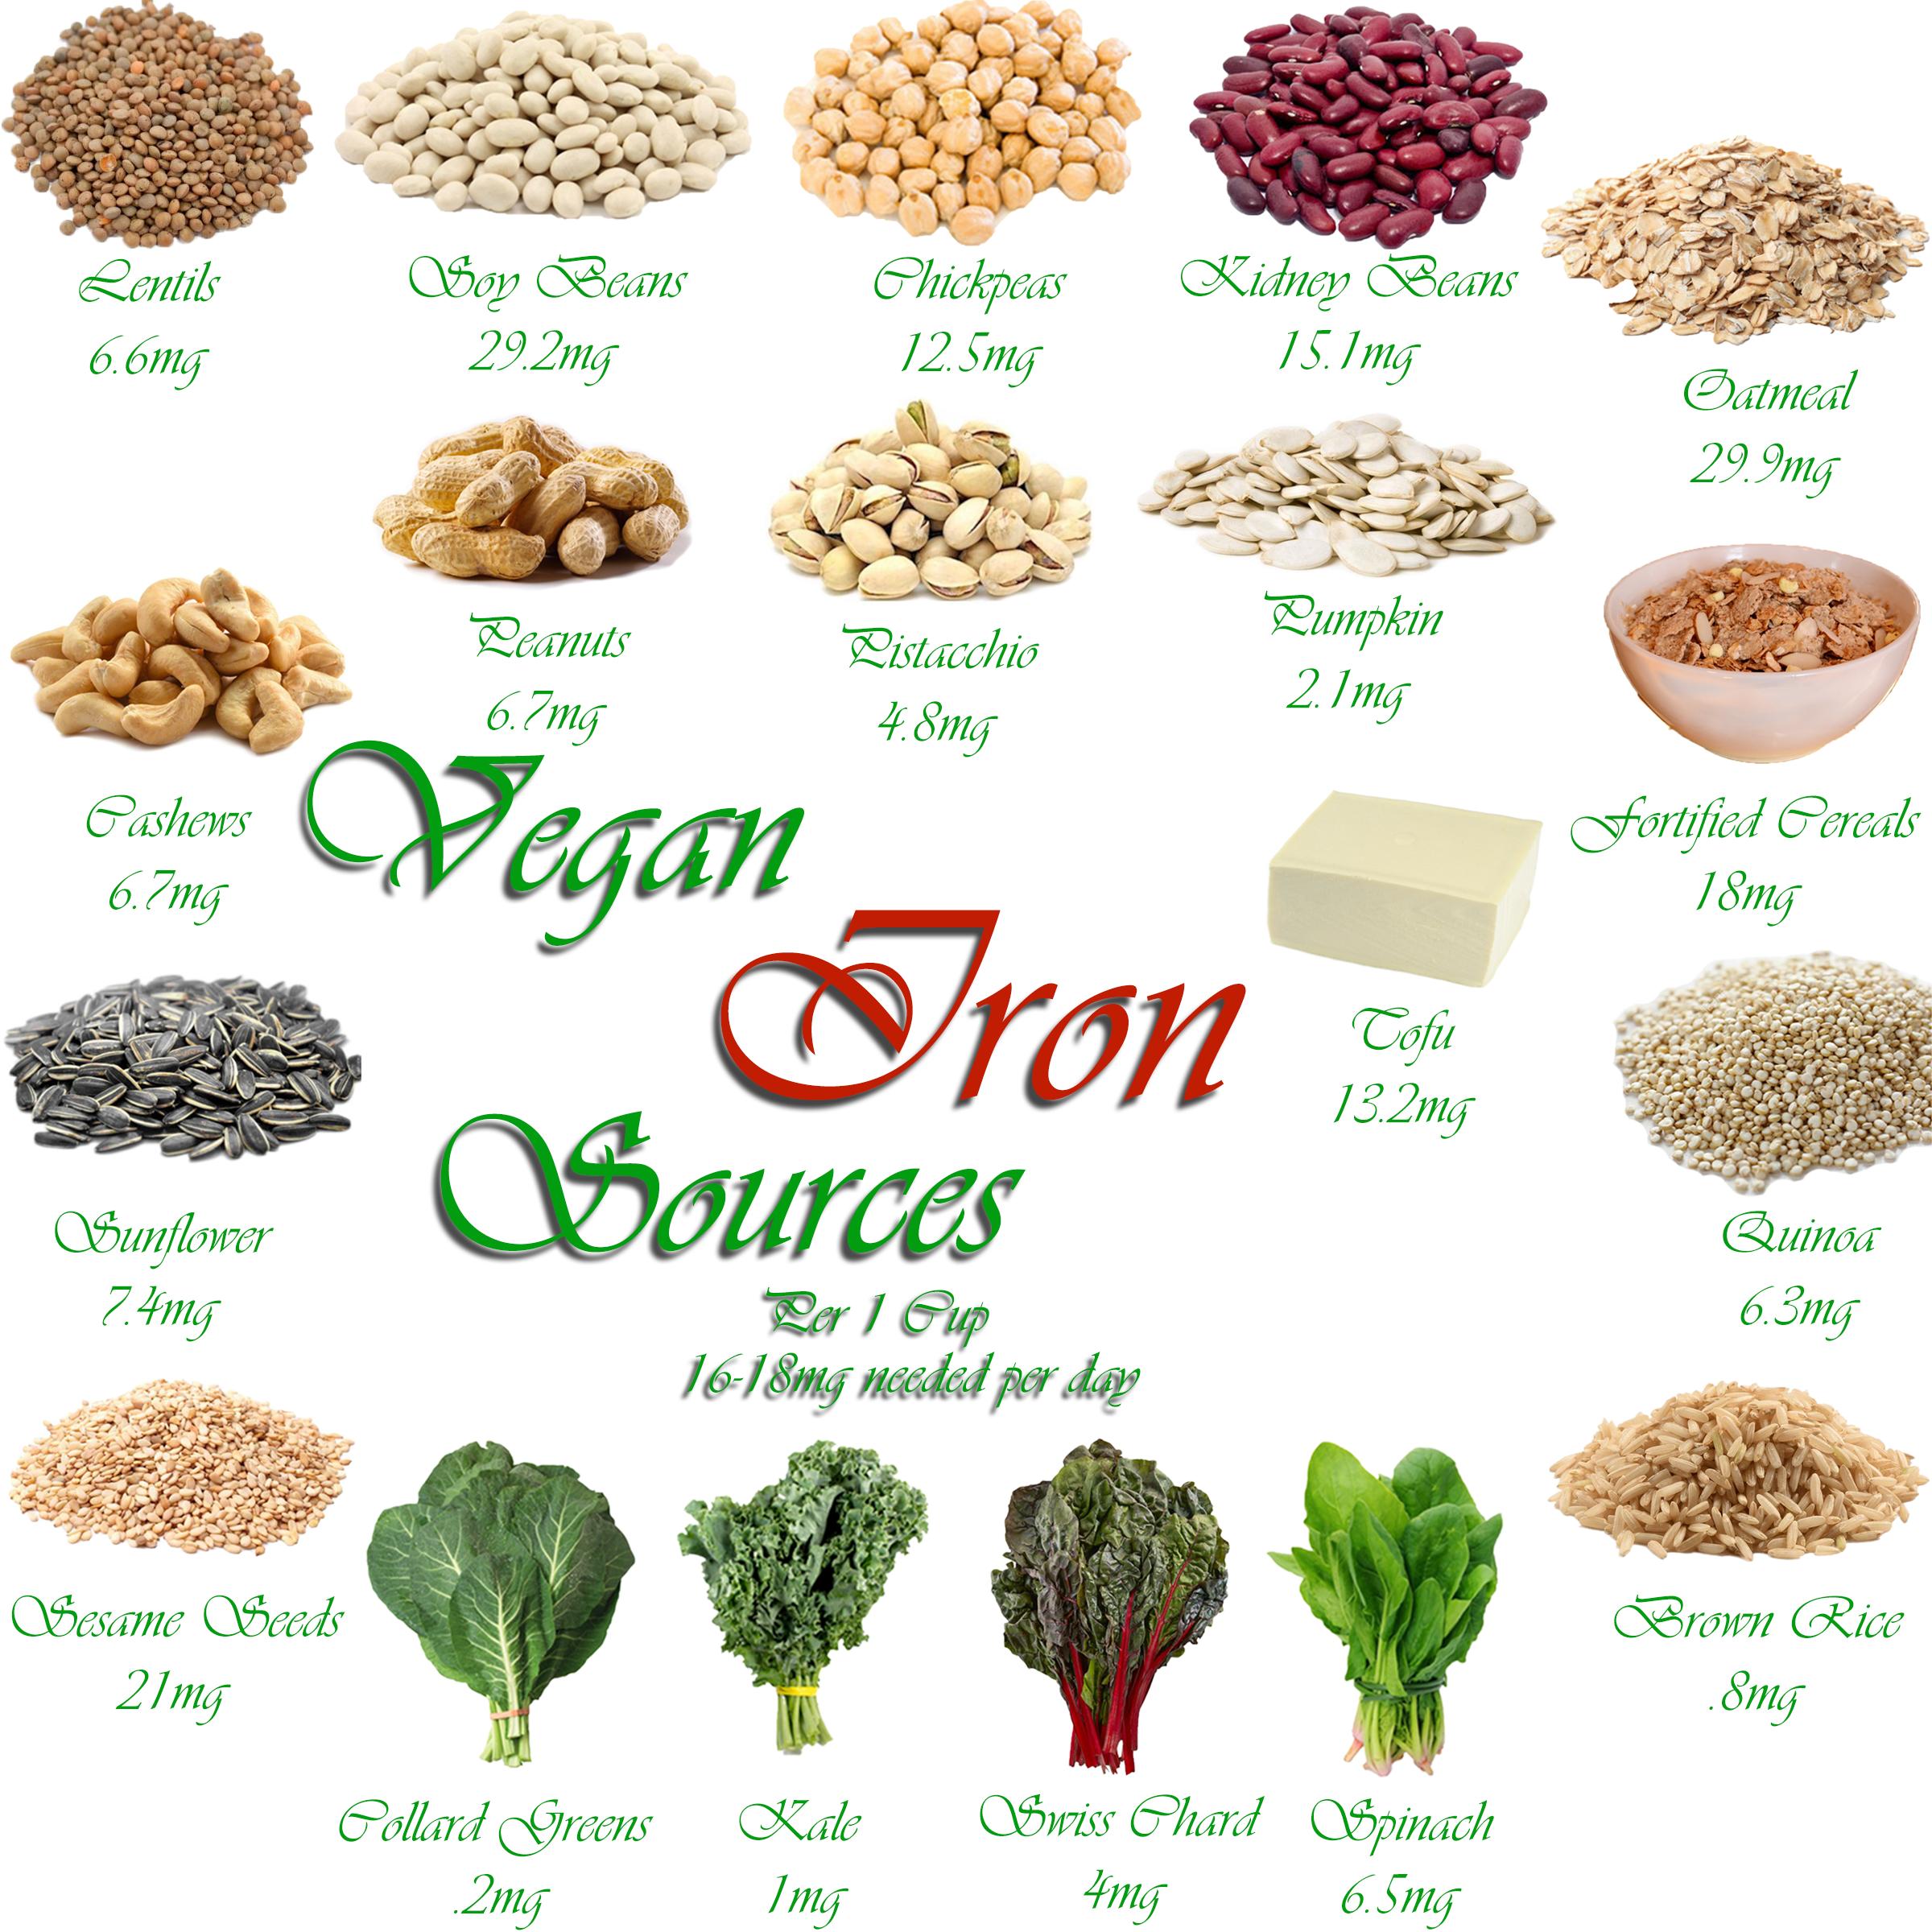 AterImber.com - The Veg Life - Vegan Nutrient Collage Series - Where Do Vegans Get Their Iron?